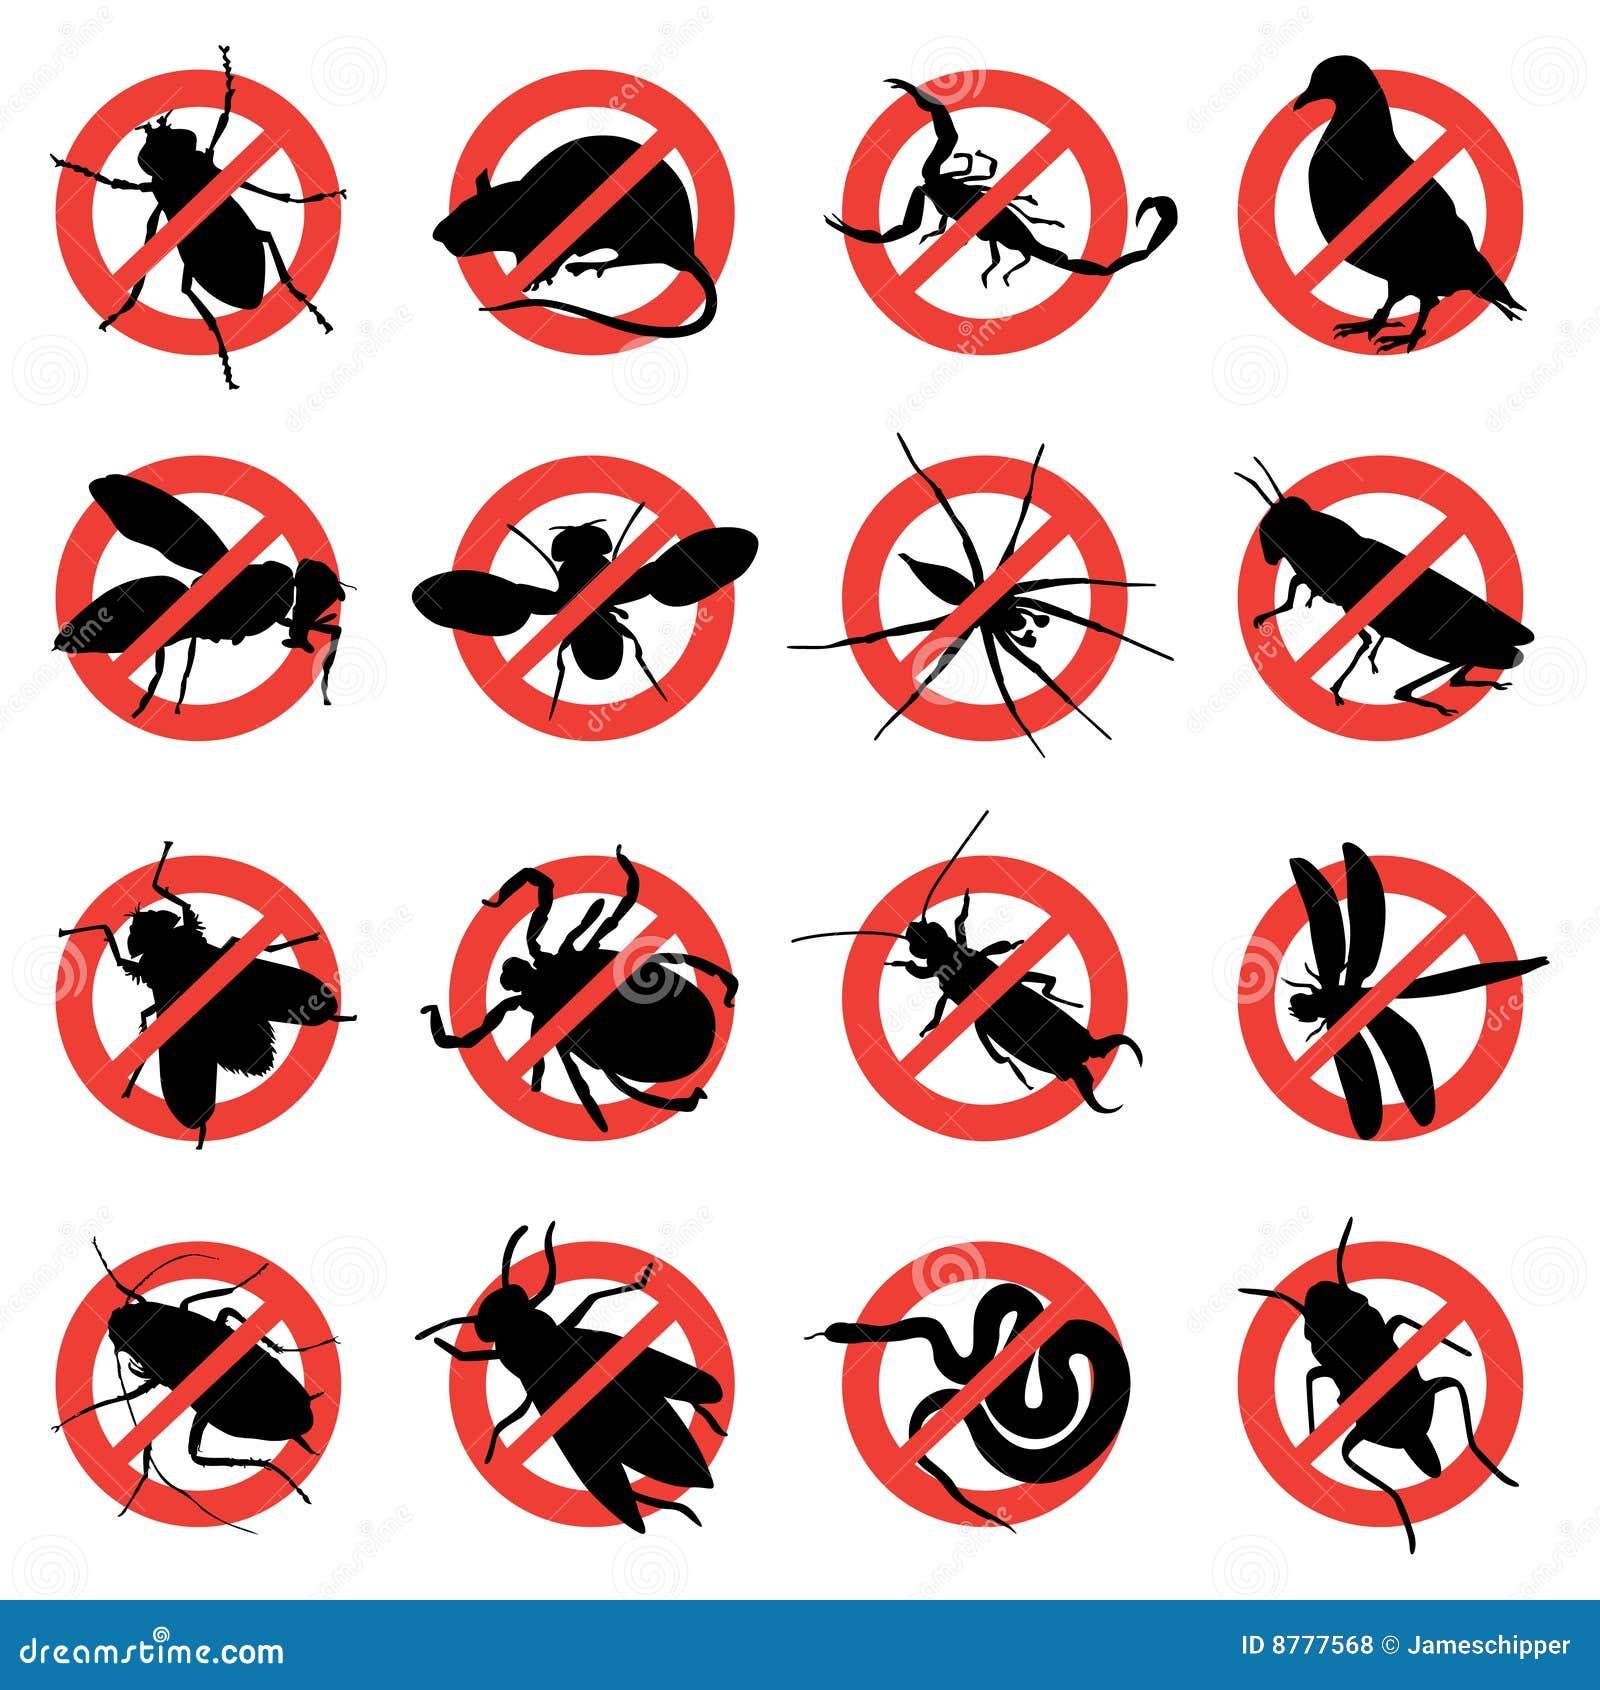 Pest stock illustrations 11257 pest stock illustrations rodent and pest warning signs rodent and pest with warning signs royalty free stock photos biocorpaavc